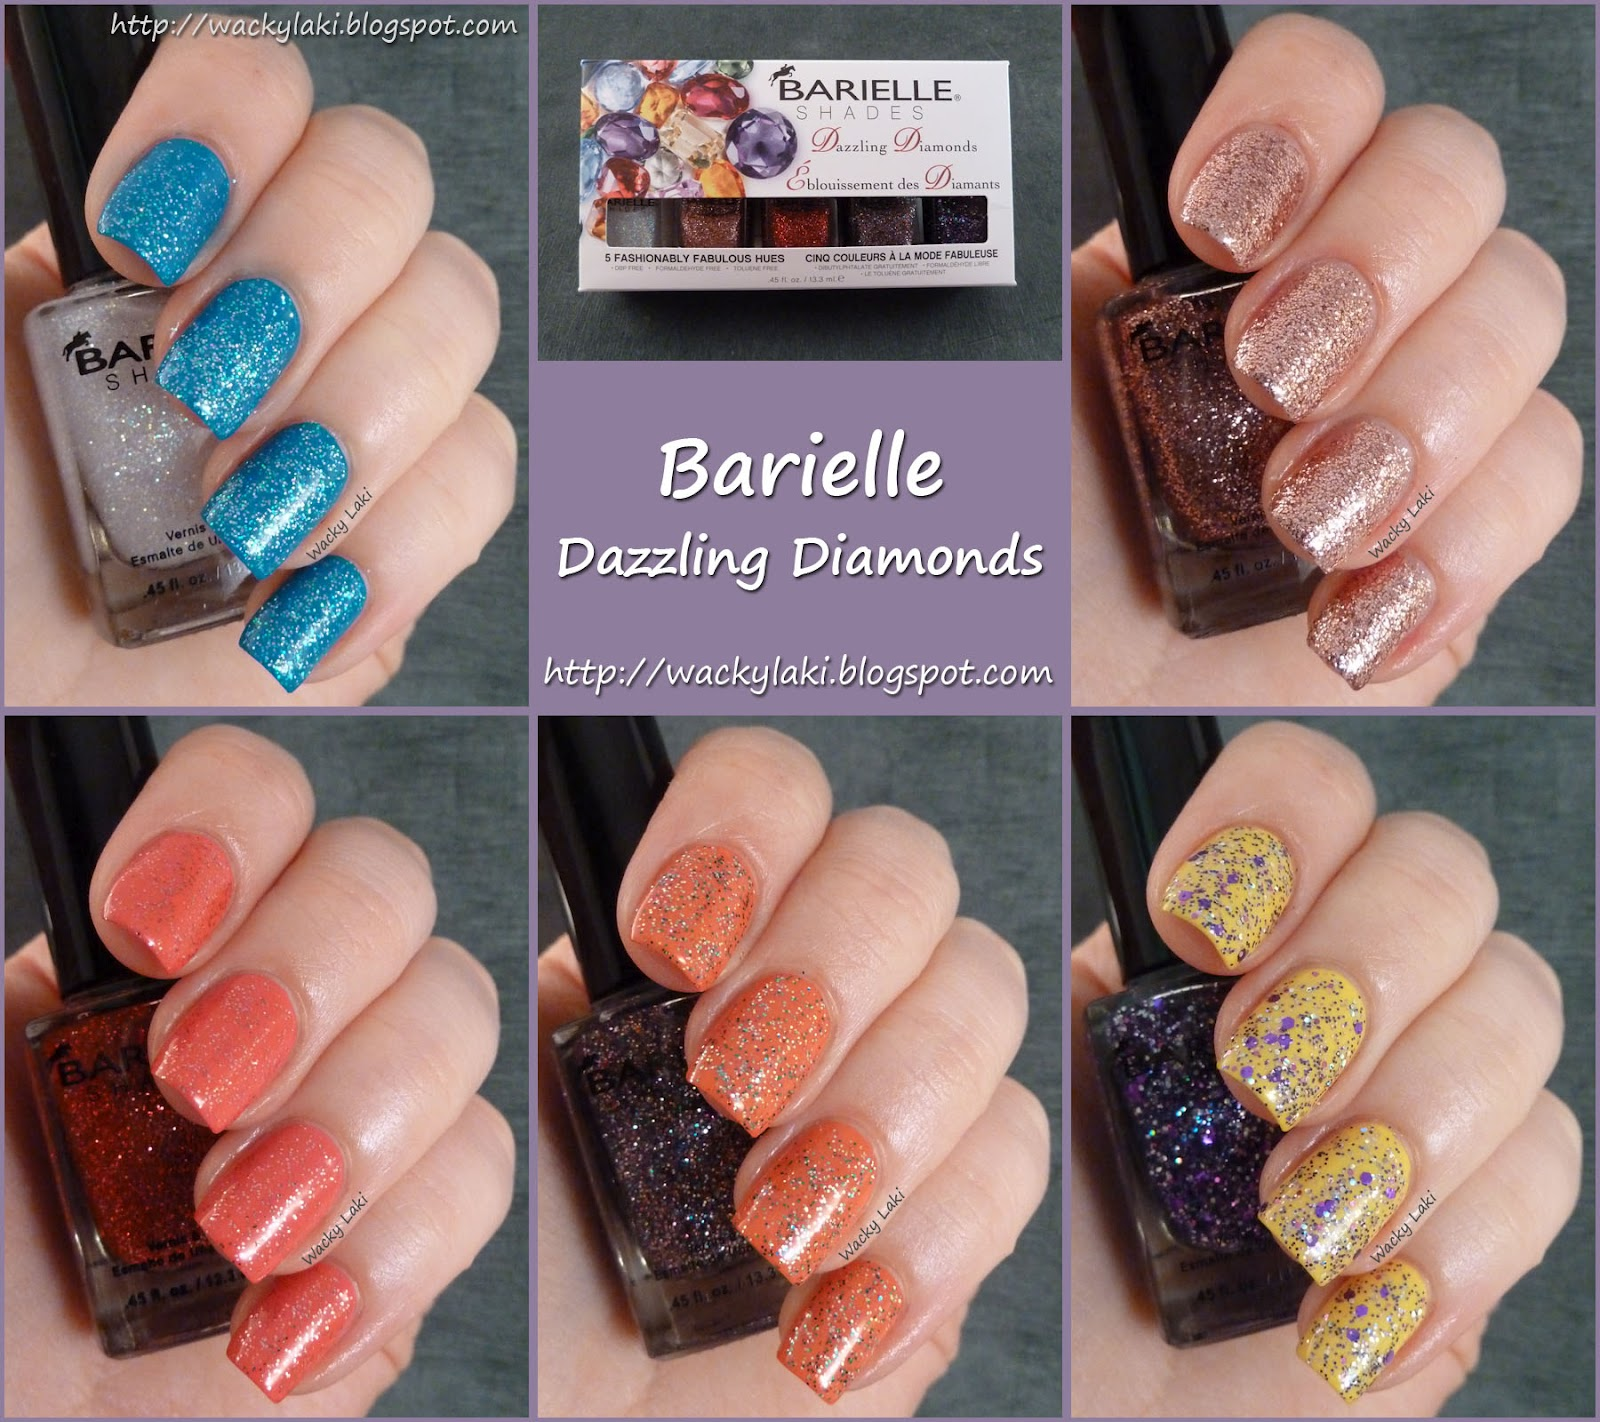 Wacky Laki: Barielle: Dazzling Diamonds Collection